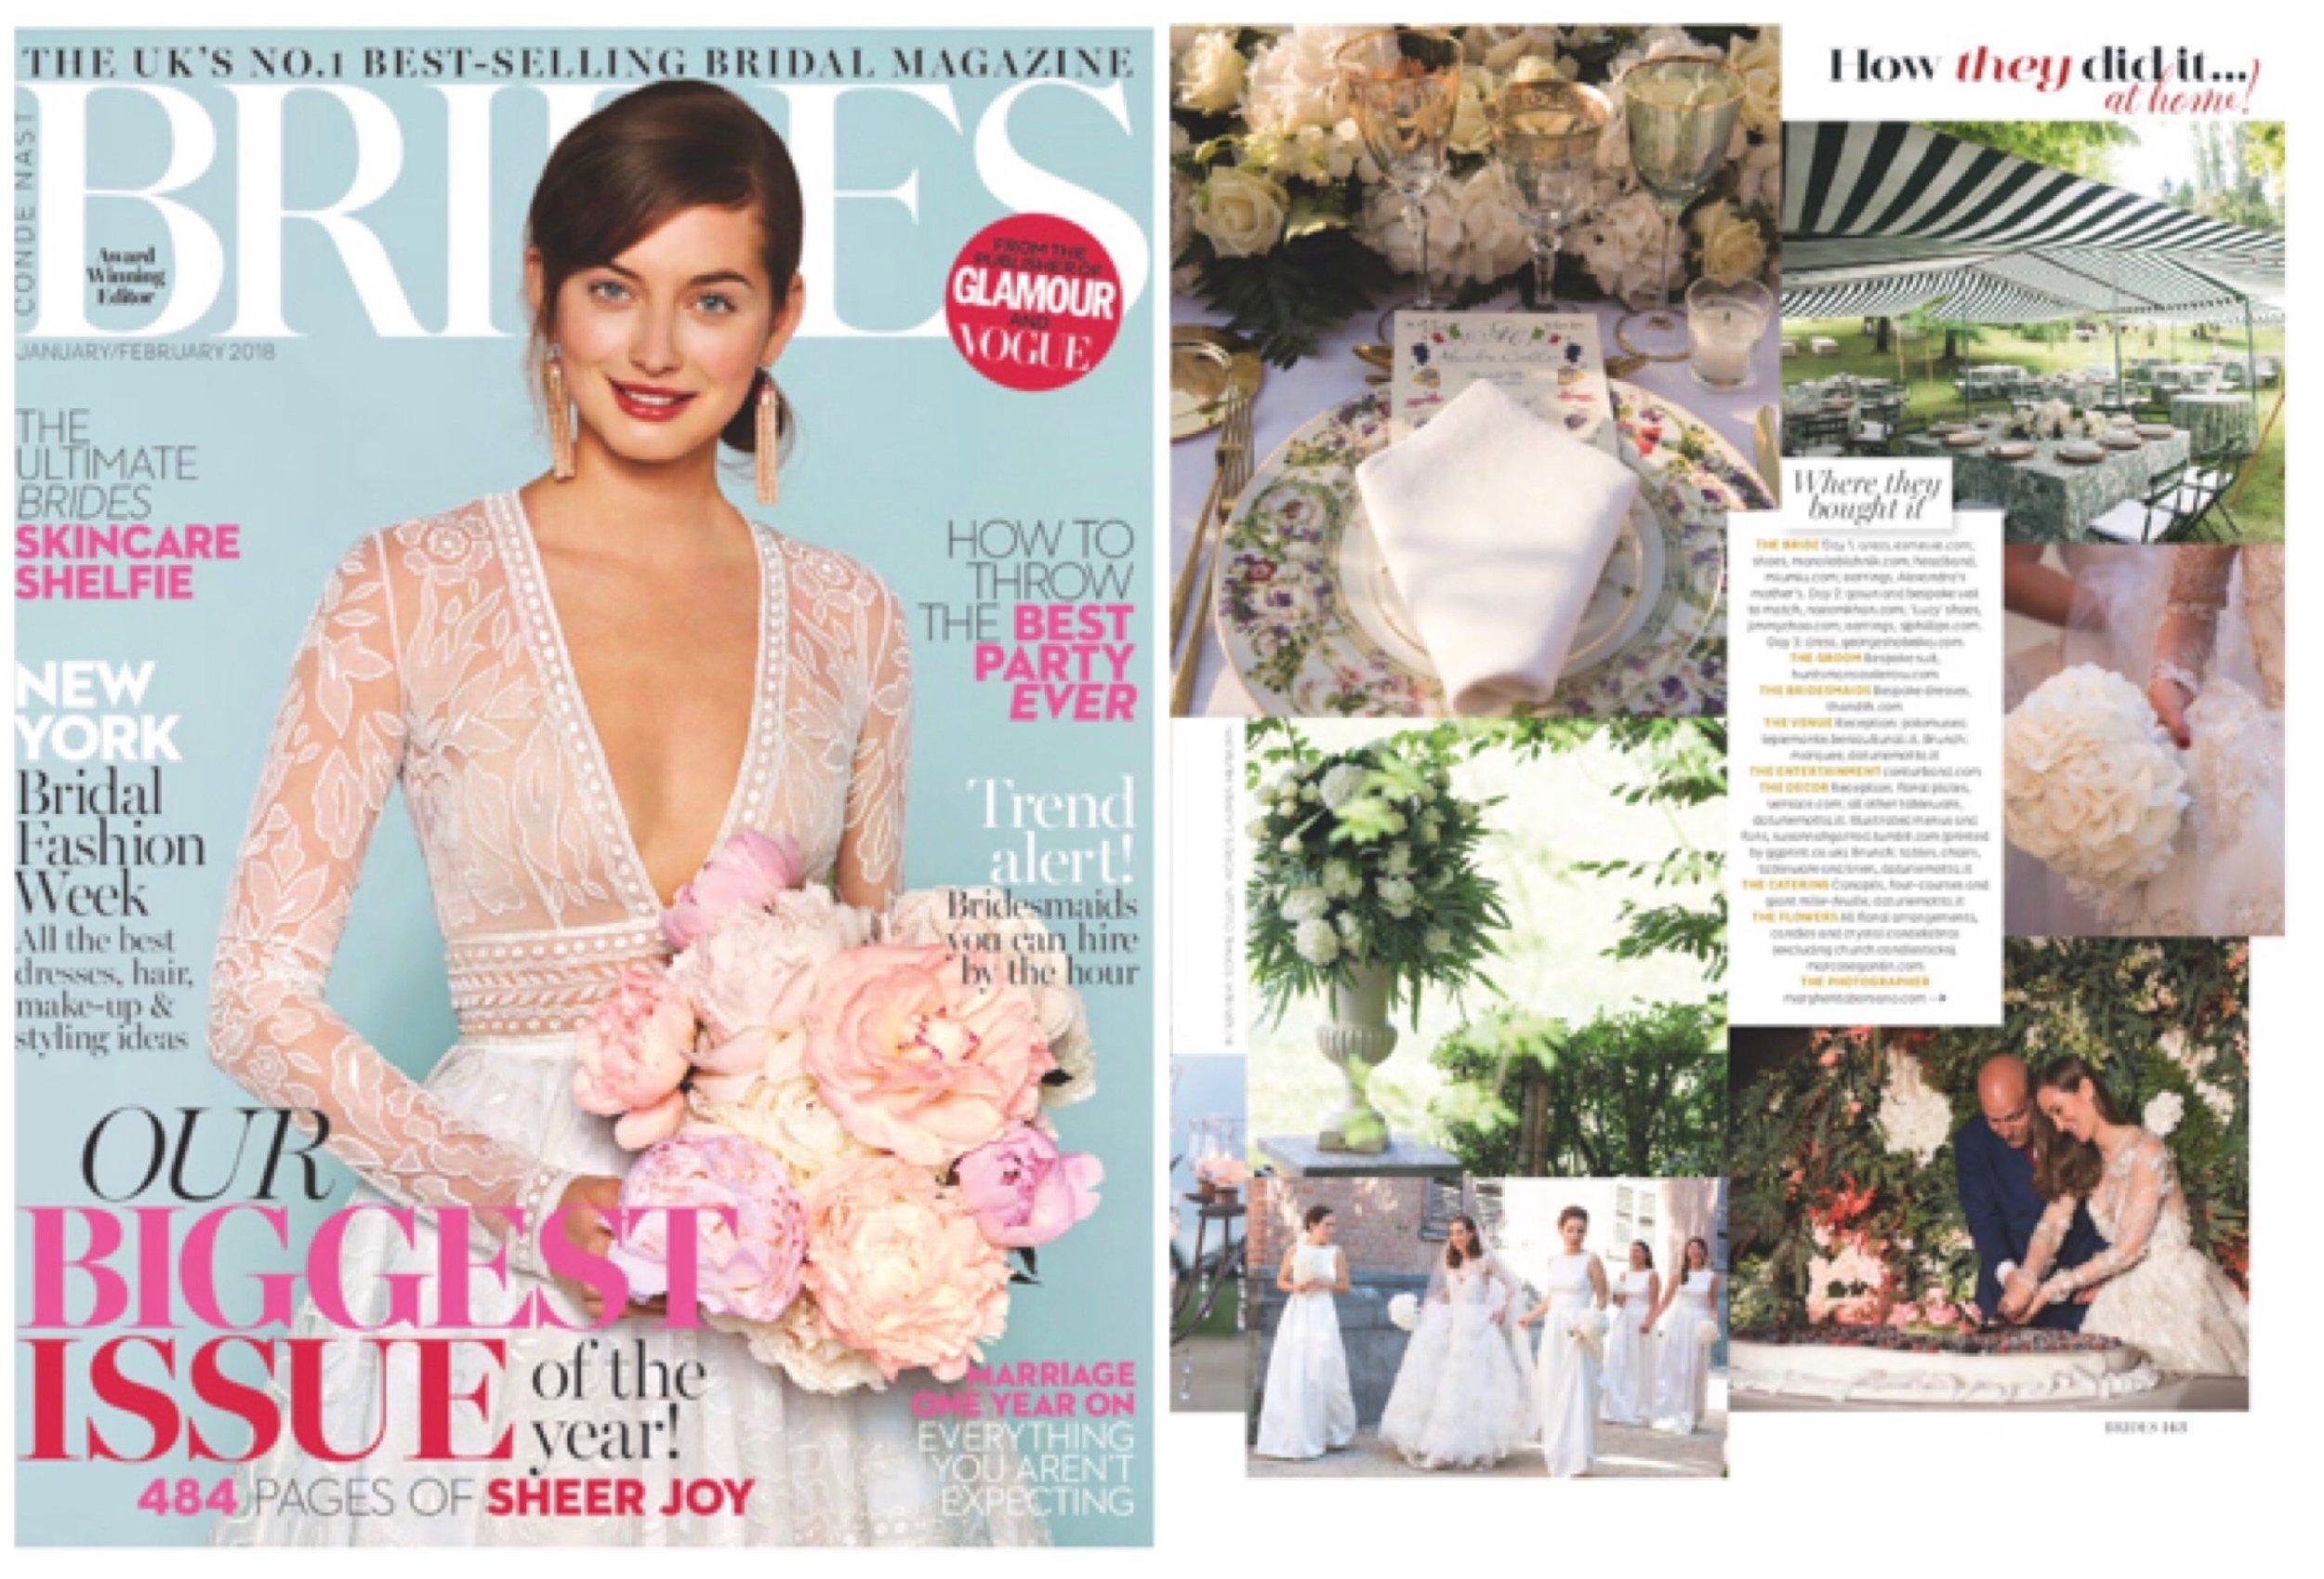 Brides Magazine - Jan/Feb 2018